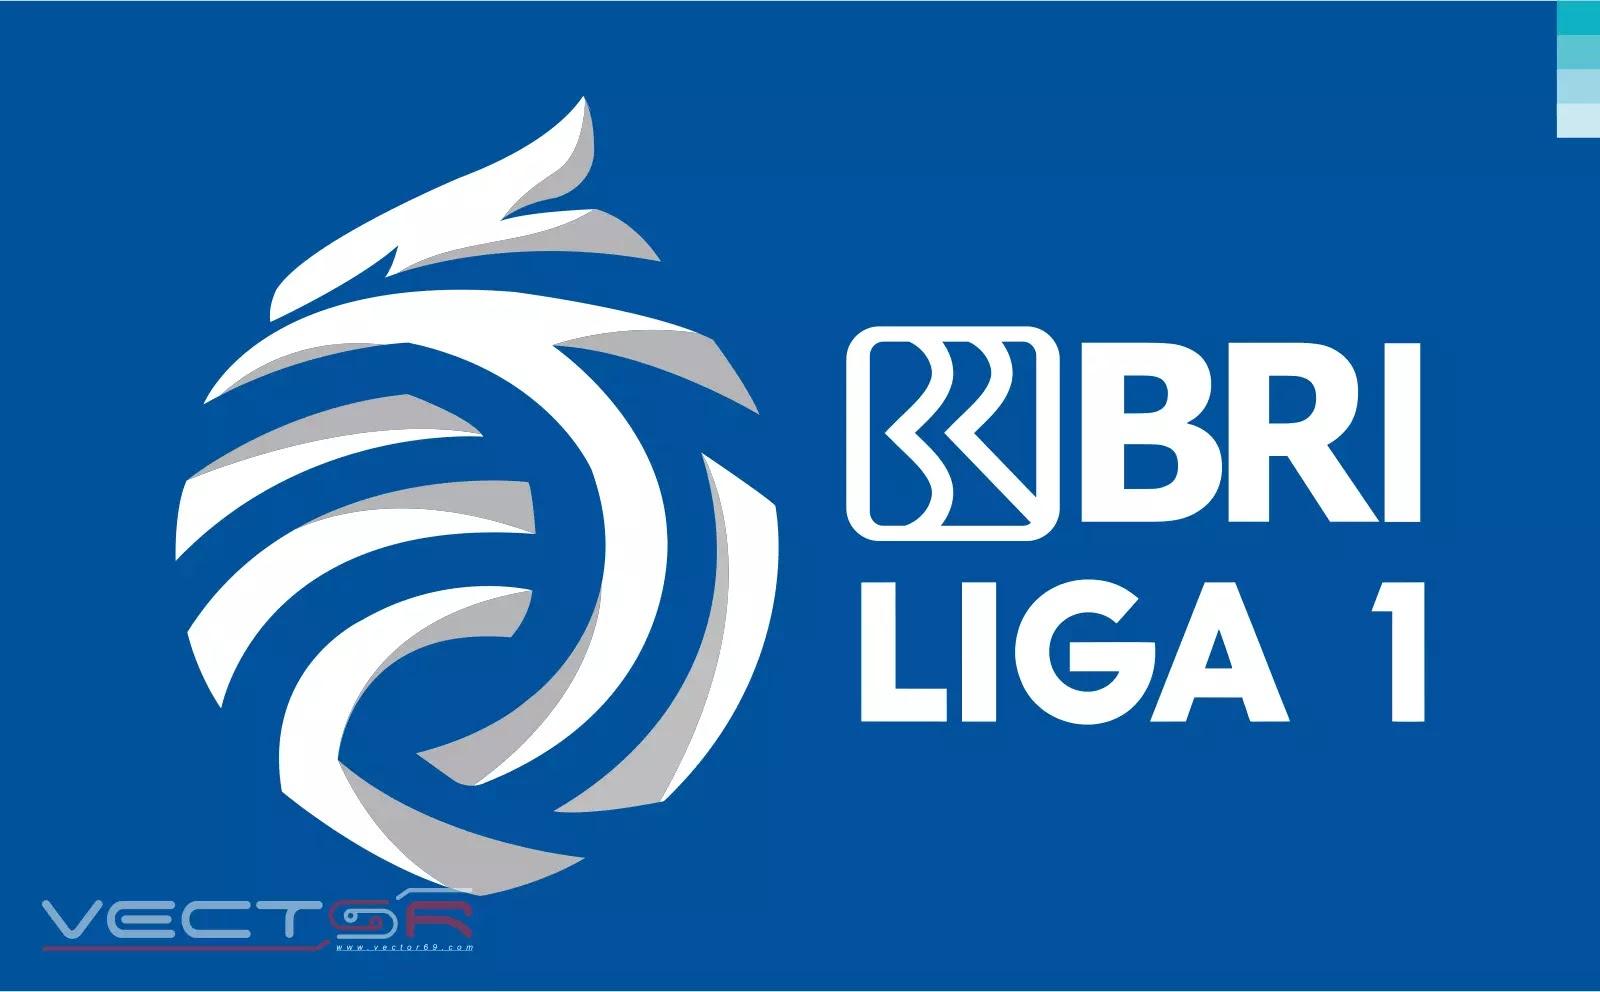 BRI Liga 1 Indonesia Secondary Logo - Download Vector File SVG (Scalable Vector Graphics)